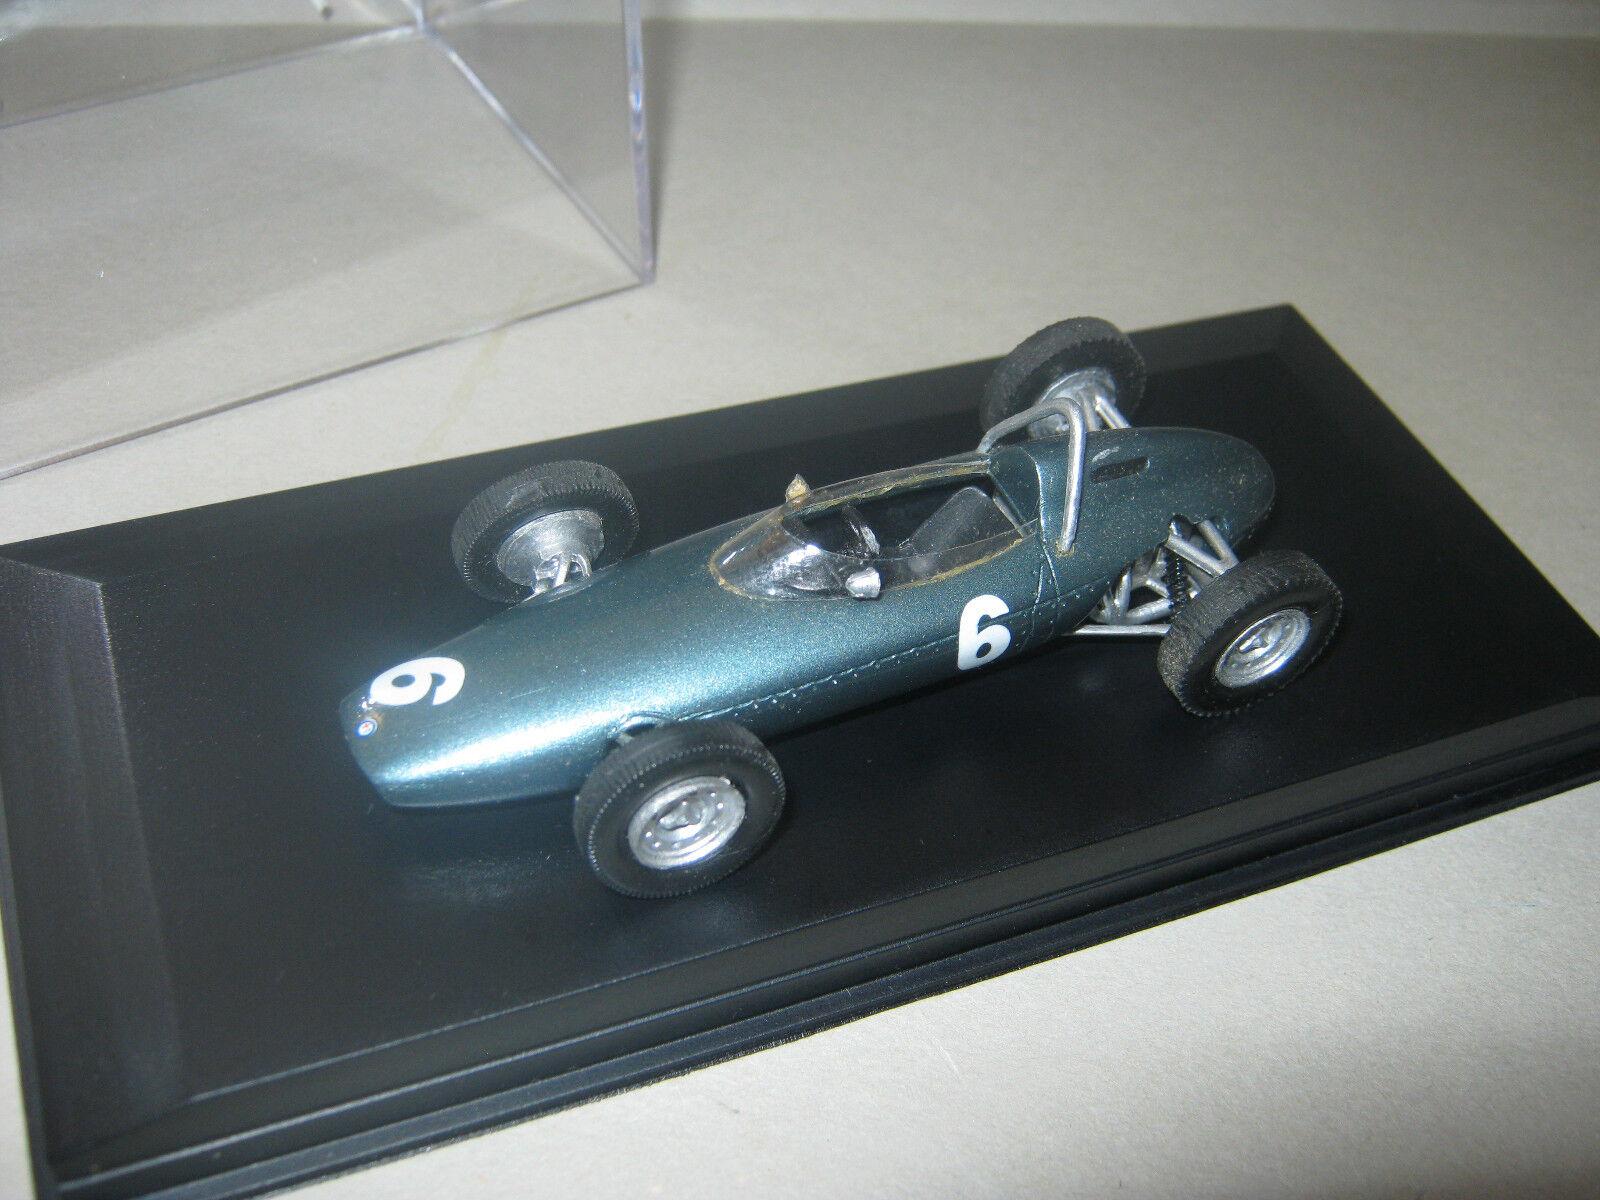 1 43 Brm p57 G. Hill Monaco GP Winner 1963 HANDBUILT MODELCAR dans Showcase Top